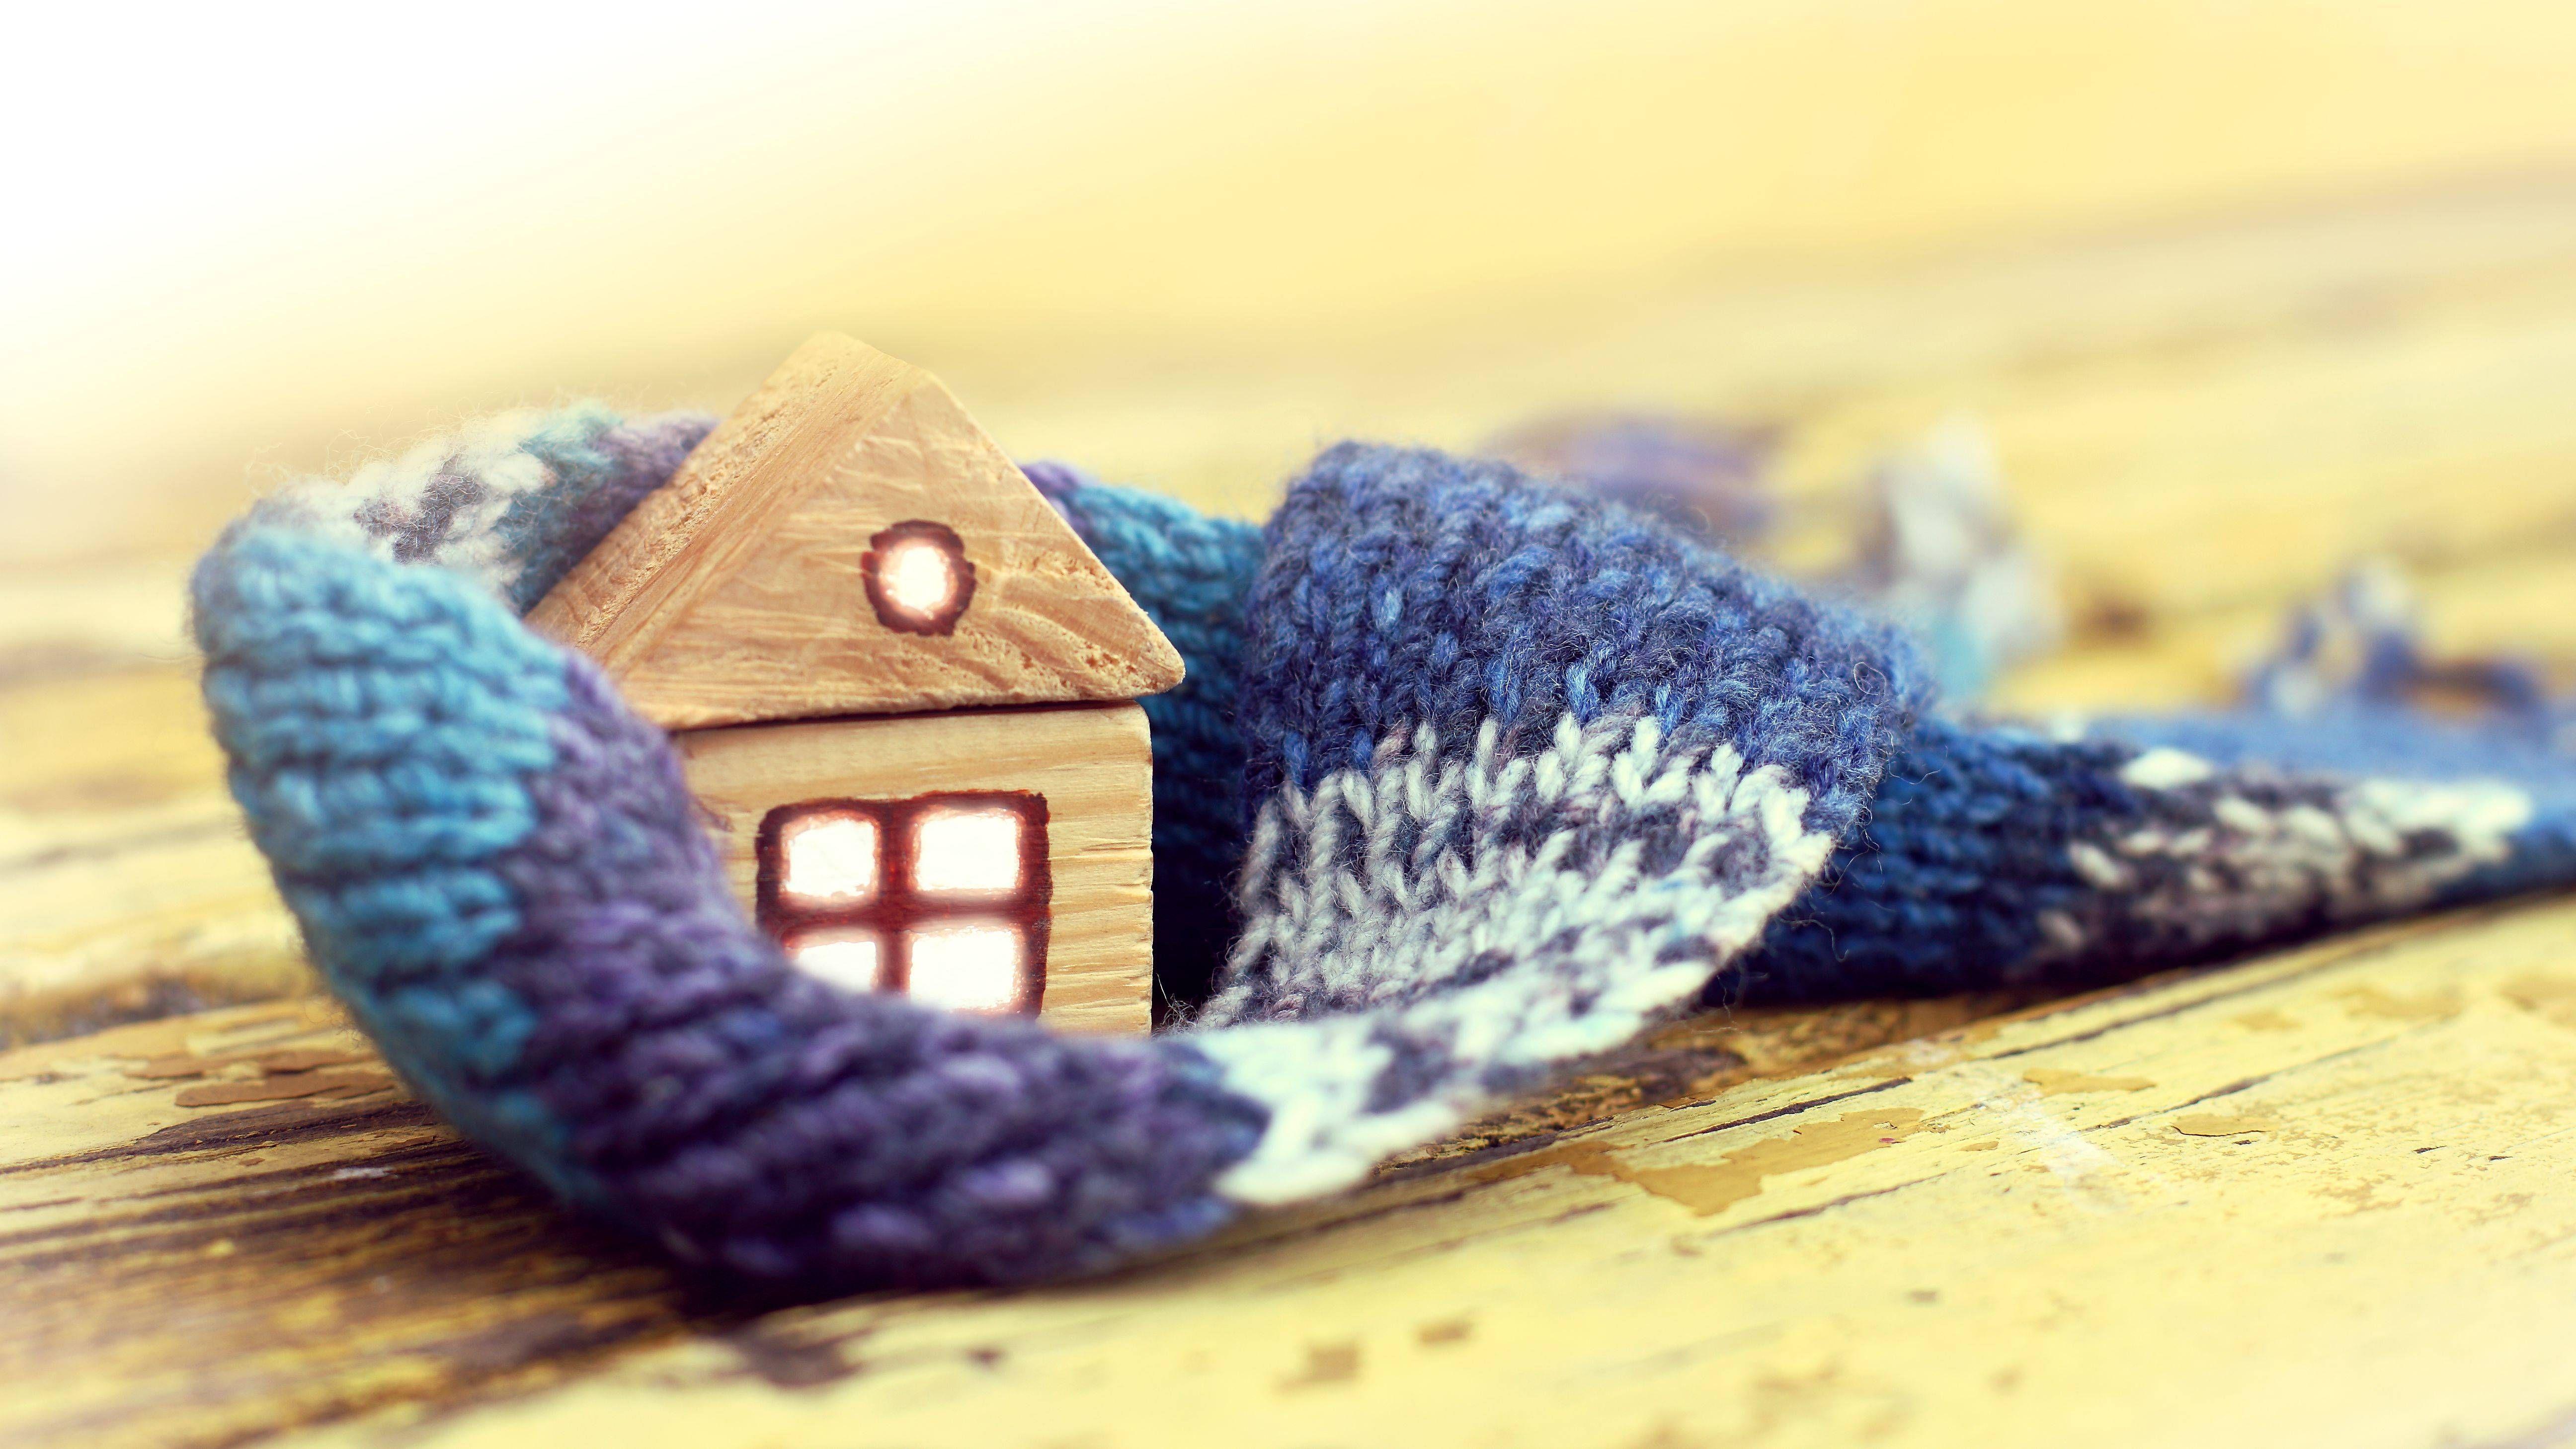 Calfeutrer sa maison pour l'hiver